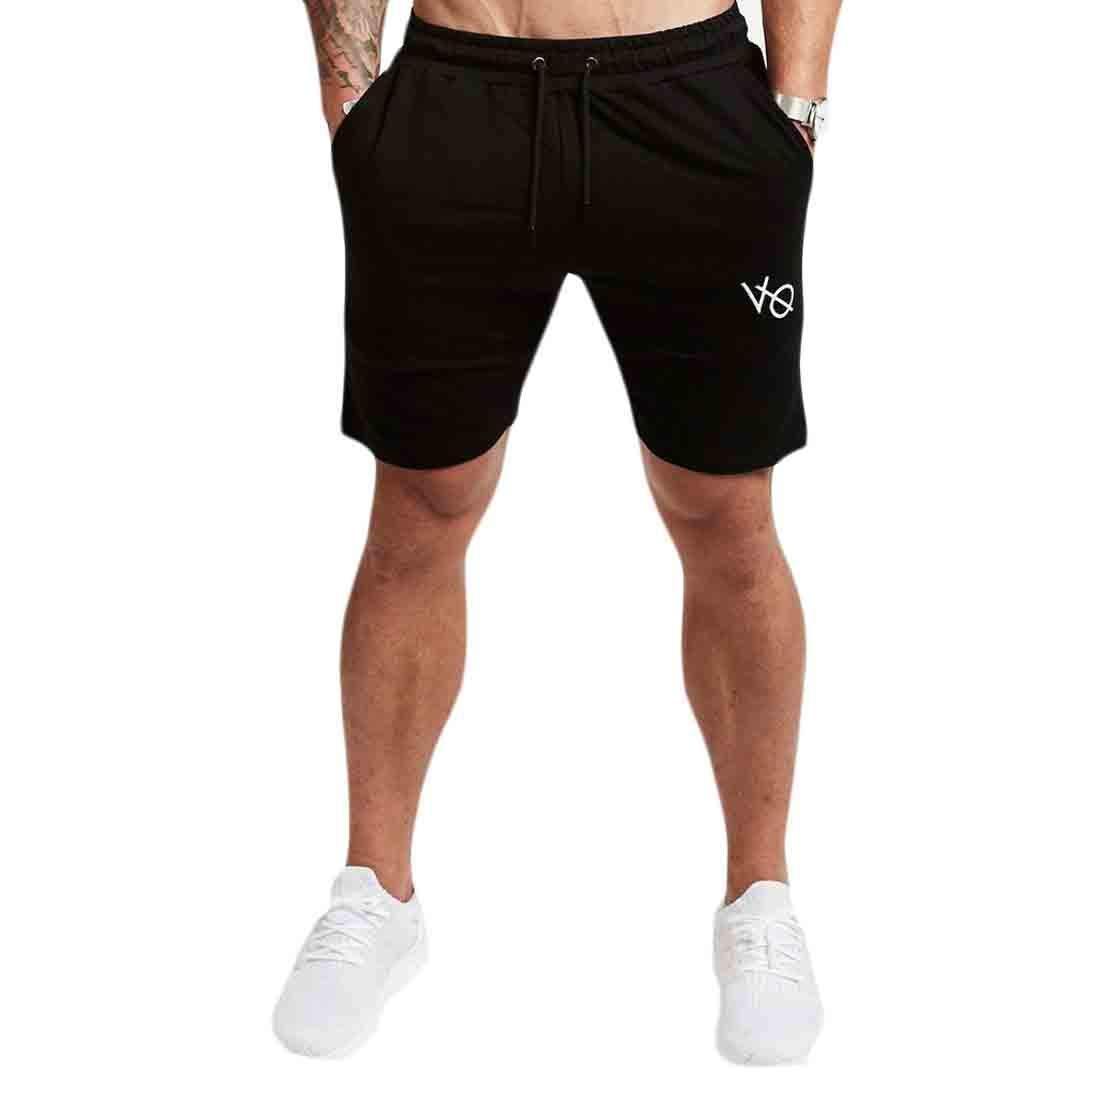 YYG Mens Running Trainning Summer Elastic Waist Active Drawstring Casual Beach Shorts Boardshort Swim Trunk